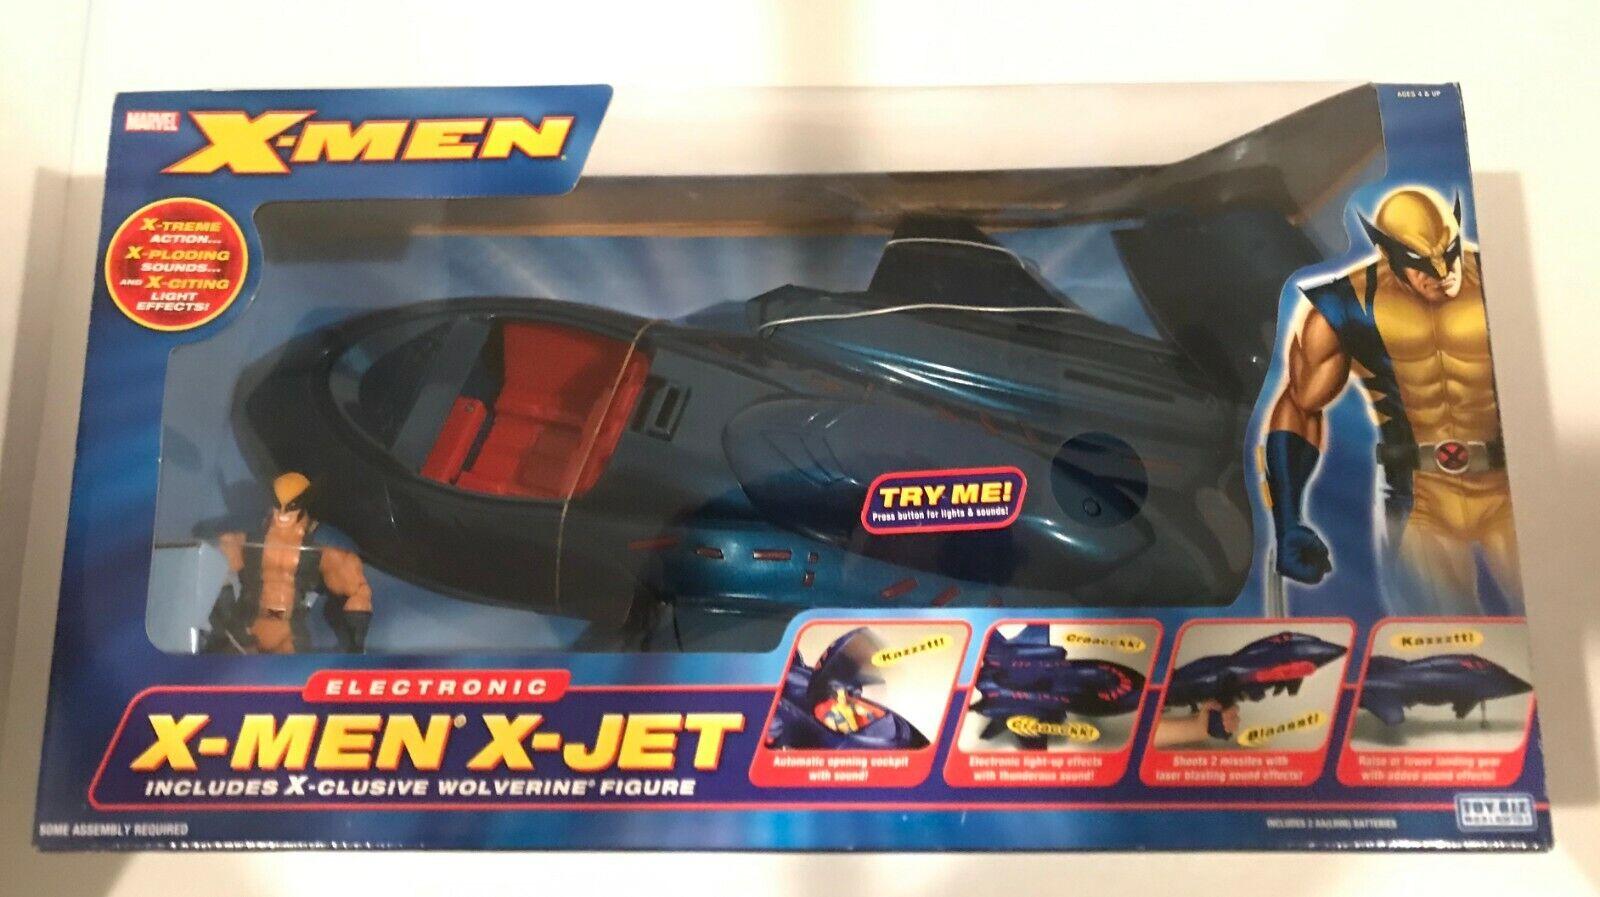 VINTAGE giocattoloBIZ ELECTRONIC Xessi JET  WOLVERINE cifra 2005 FACTORY SEALED RARE